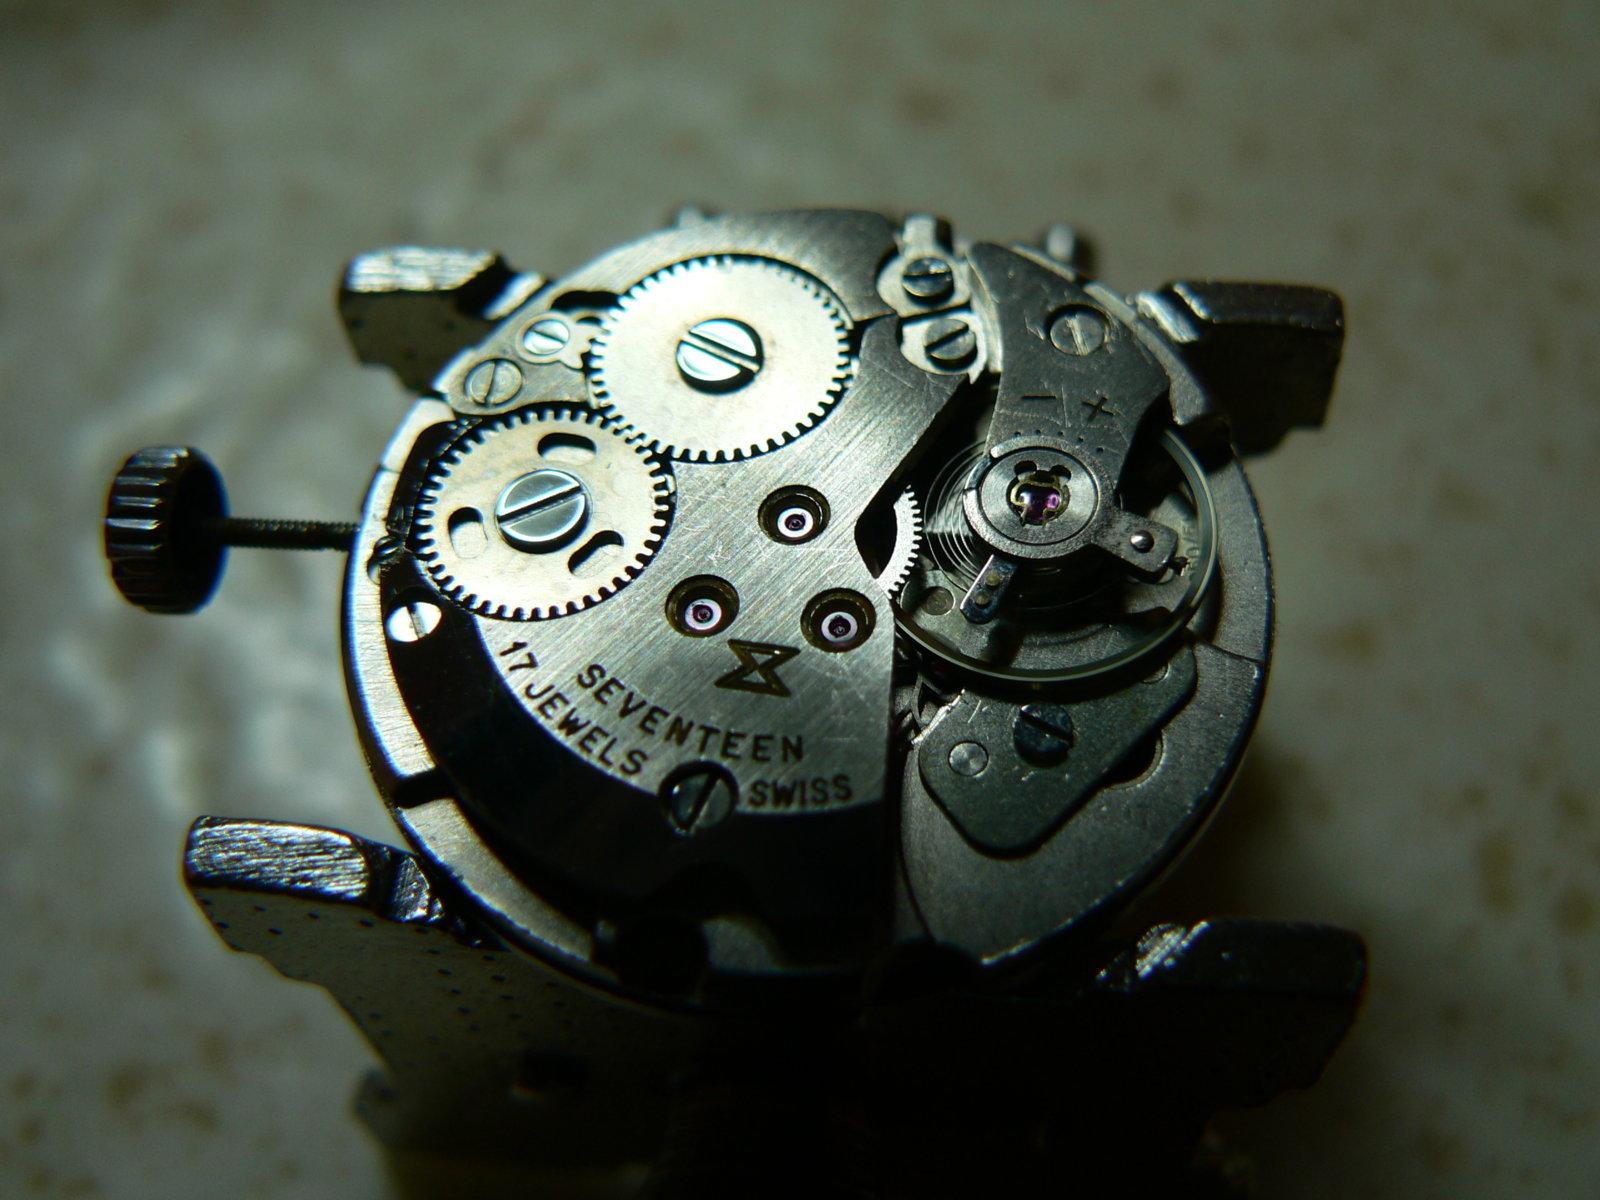 P1020722.JPG